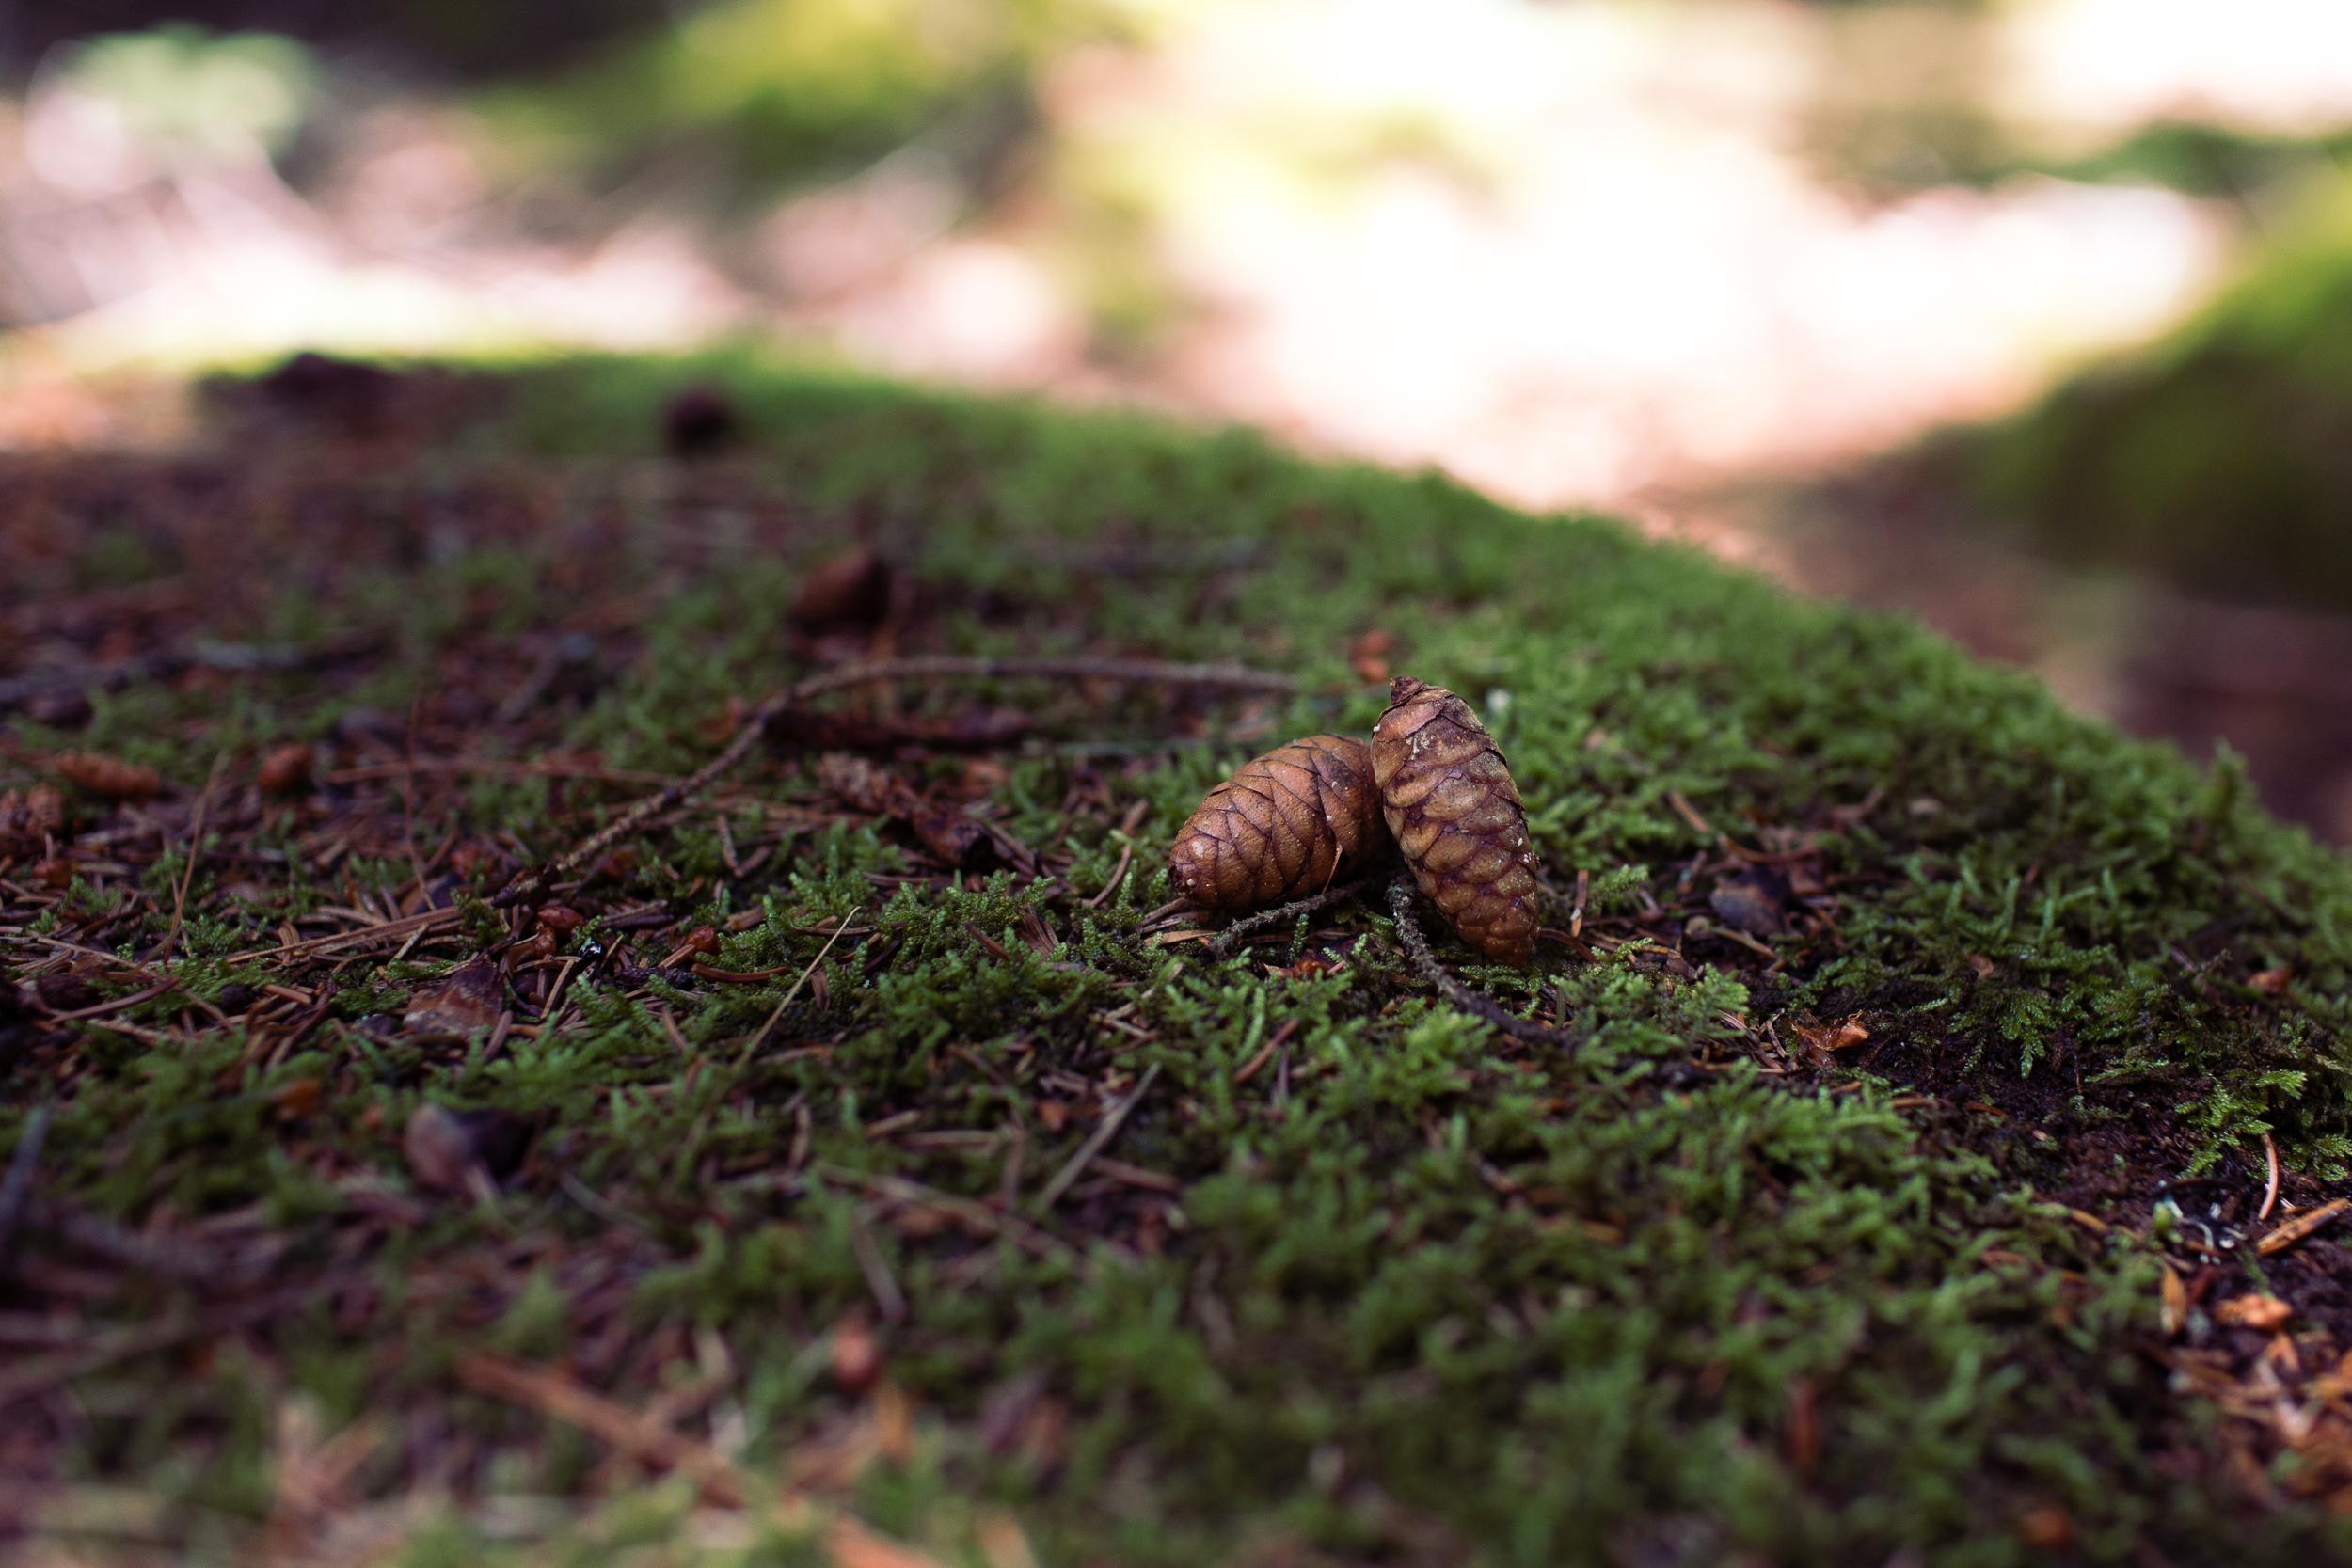 acadia-national-park-anna-mcclellan-photography-3097.jpg